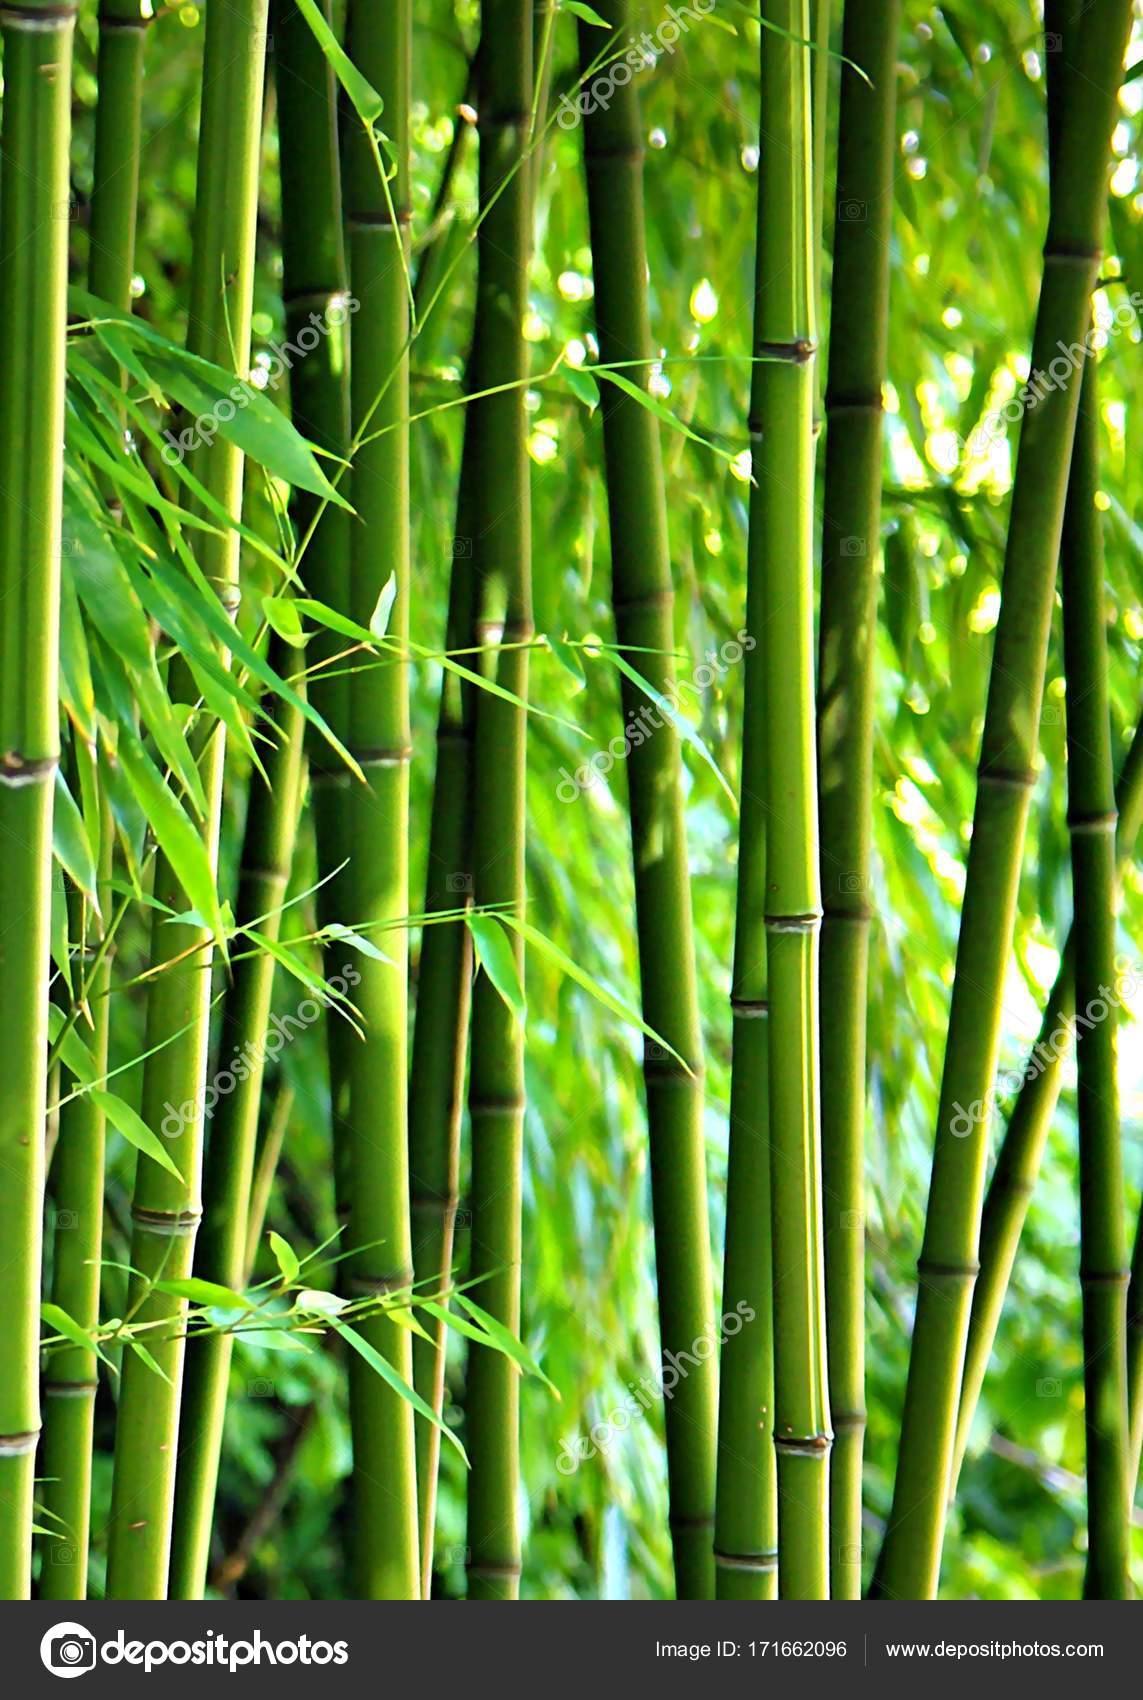 bambus staebe gruen foto de stock gabii40 171662096. Black Bedroom Furniture Sets. Home Design Ideas